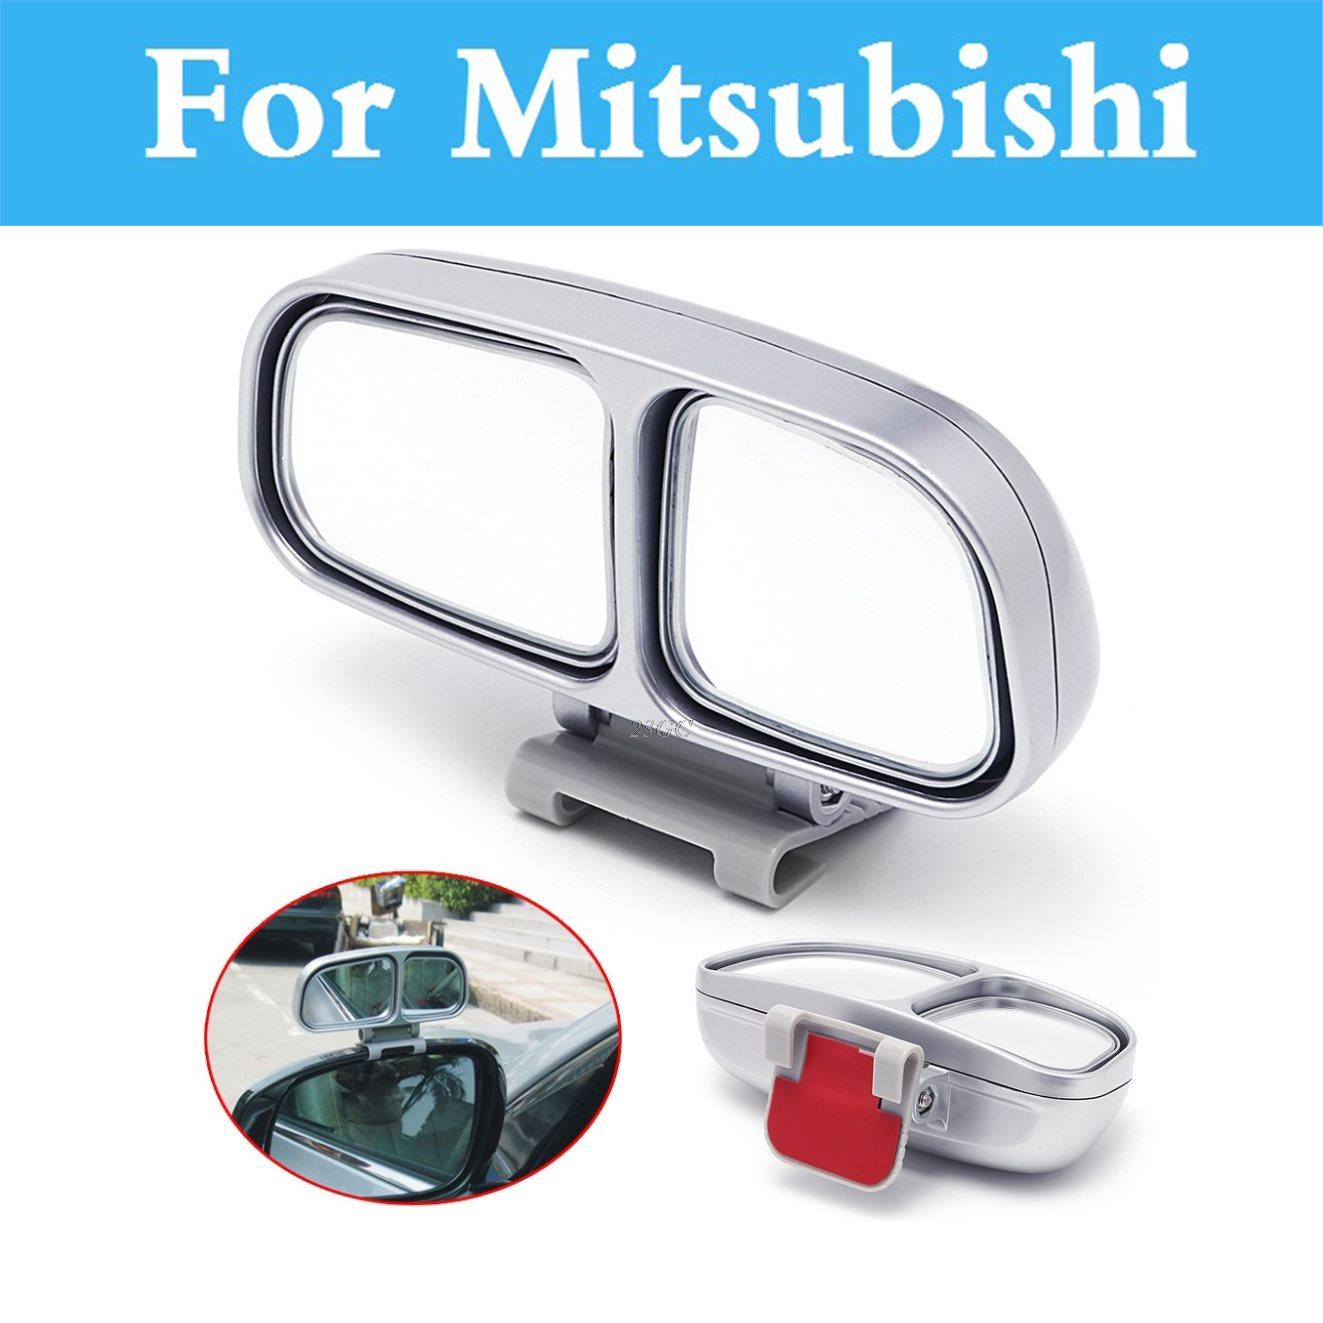 1Pc Auto Wide Angle Rear Mirror Car Blind Spot For Mitsubishi Colt Eclipse eK Attrage Carisma Challenger Endeavor Airtrek ASX